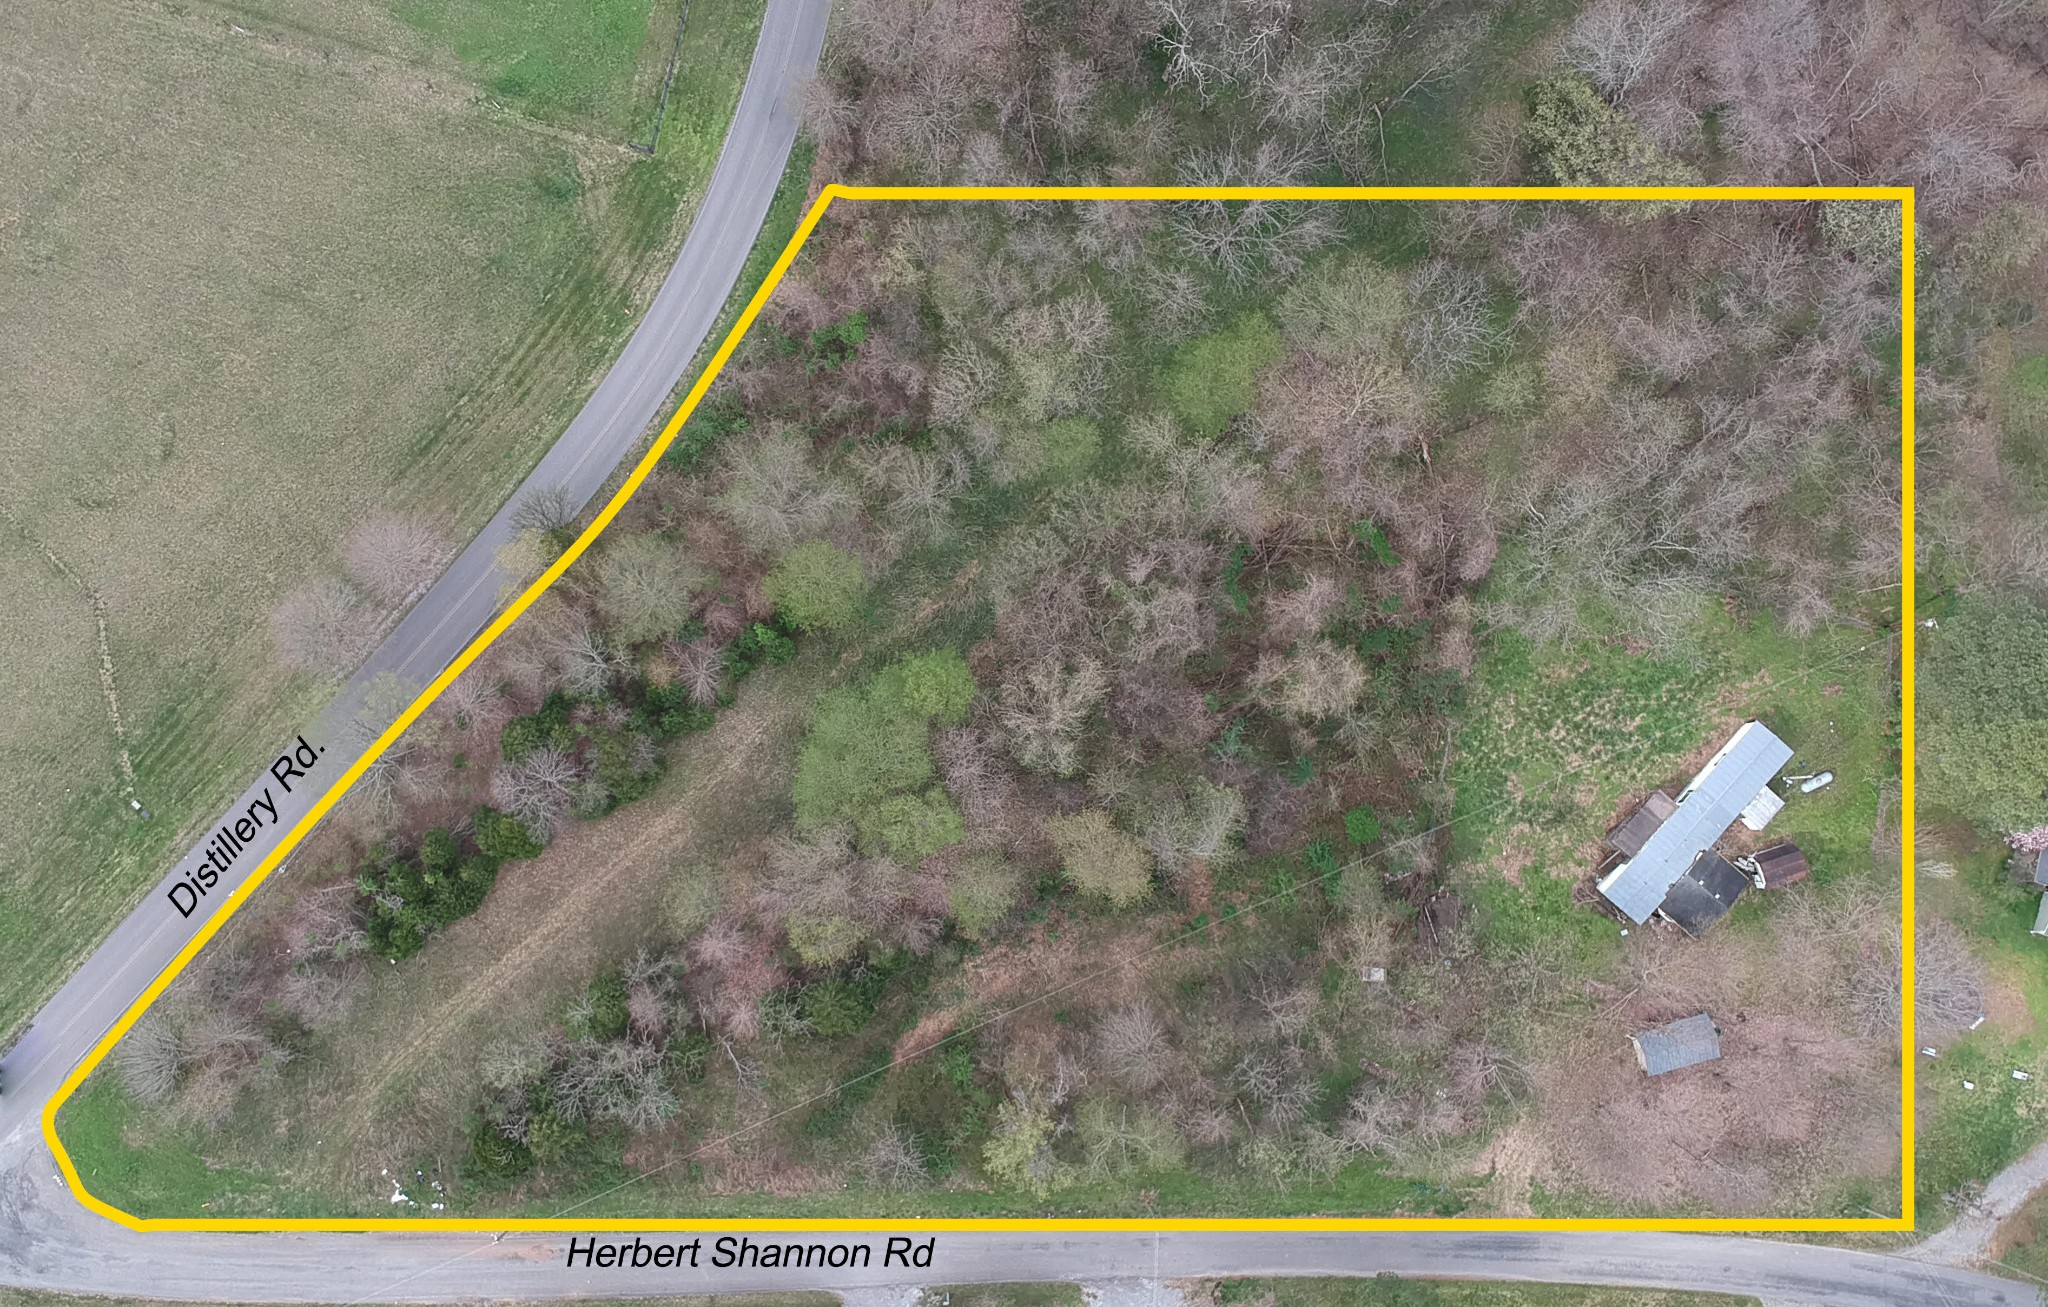 6622 Herbert Shannon Rd, Springfield, TN 37172 - Springfield, TN real estate listing